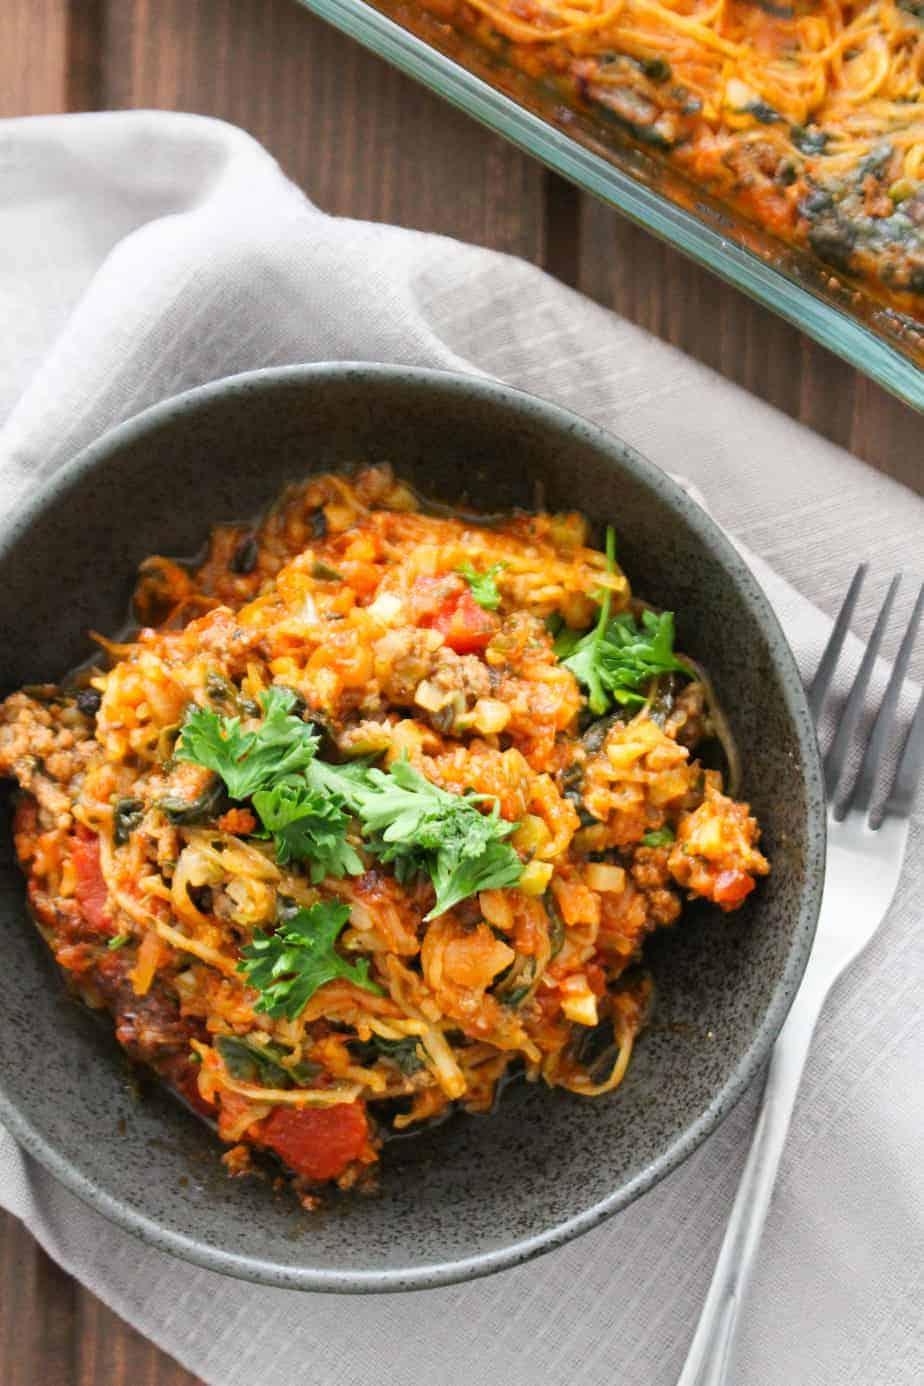 Easy Kid Friendly Pizza Spaghetti Squash Casserole | Frugal Nutrition